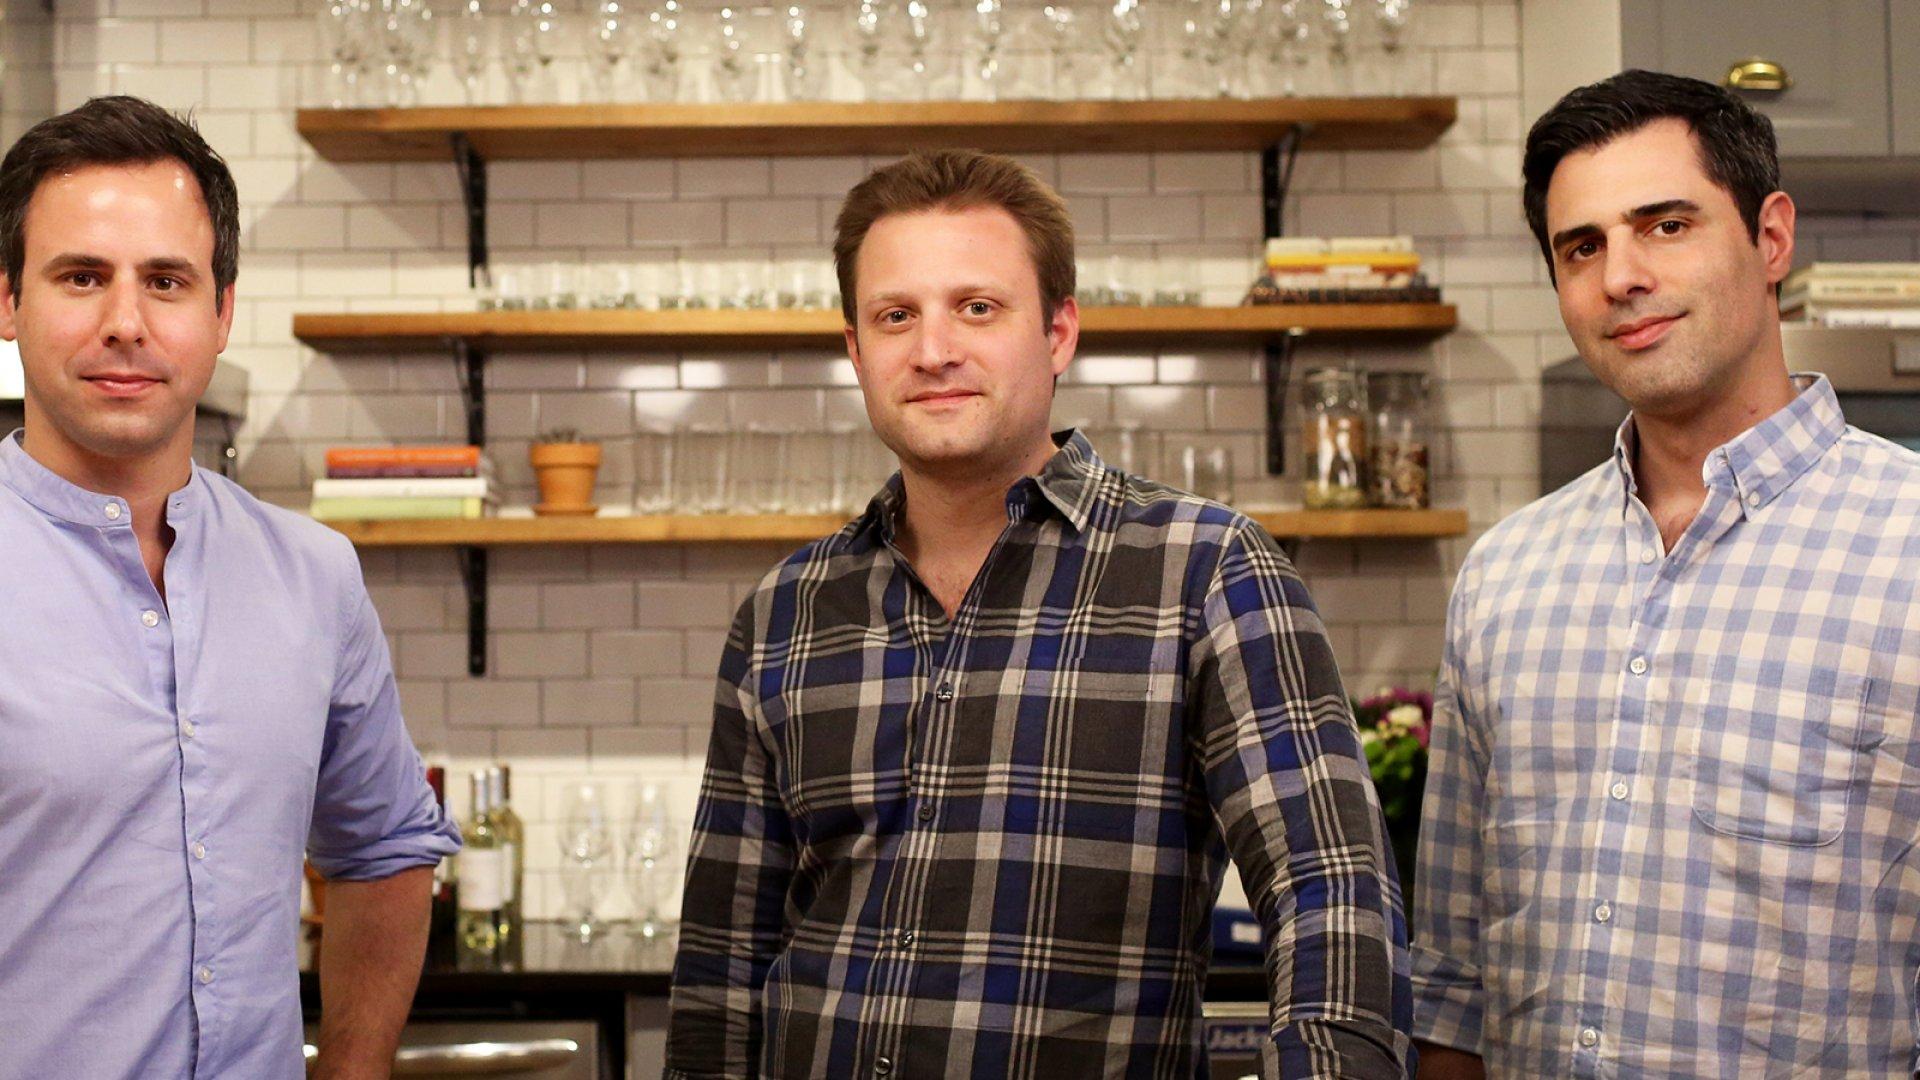 Matt Wadiak (left), Matt Salzberg, and Ilia Papas, co-founders of the recipe delivery service Blue Apron.